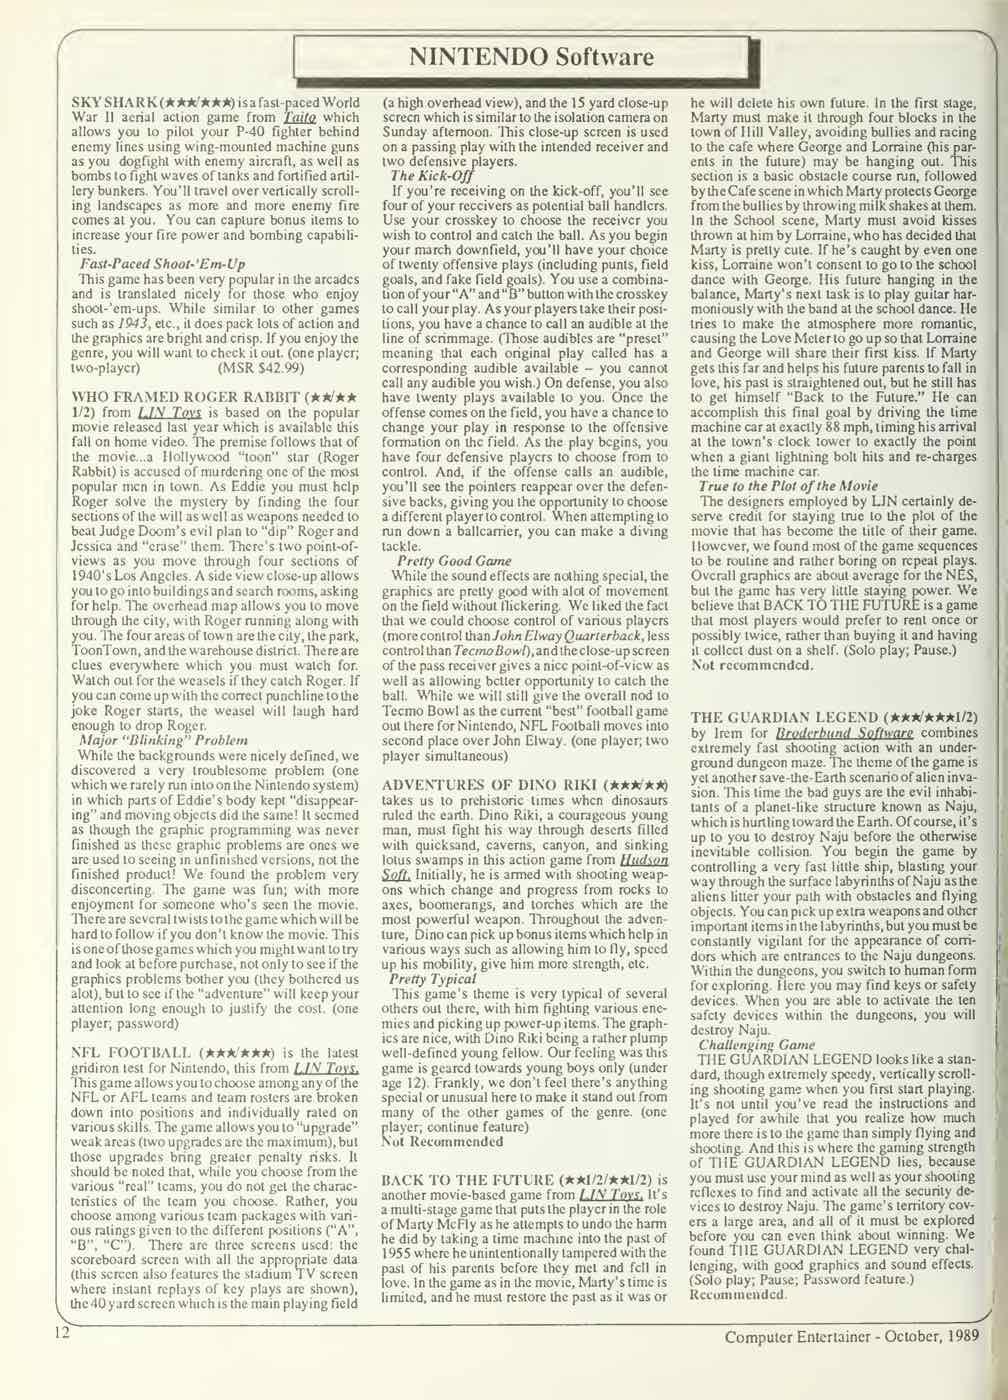 Computer Entertainer | October 1989 p12